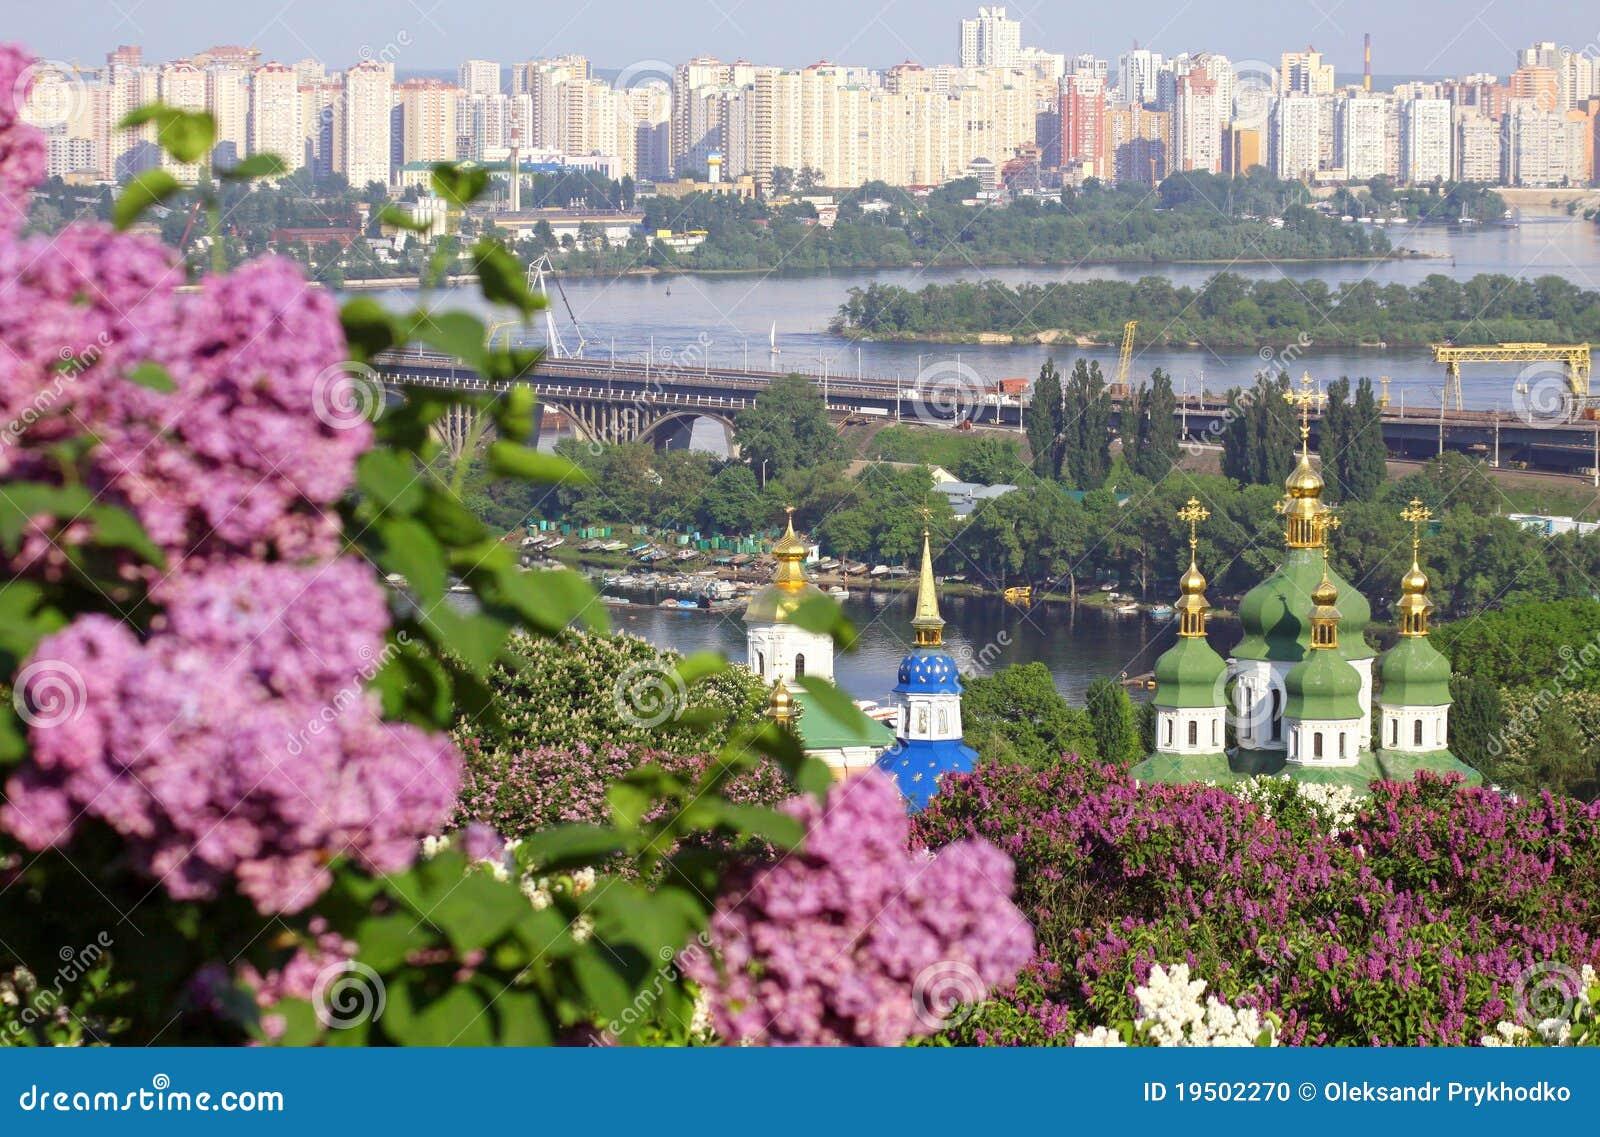 Kyiv botanical garden ukraine stock photo image 19502270 for What time does the botanical gardens close